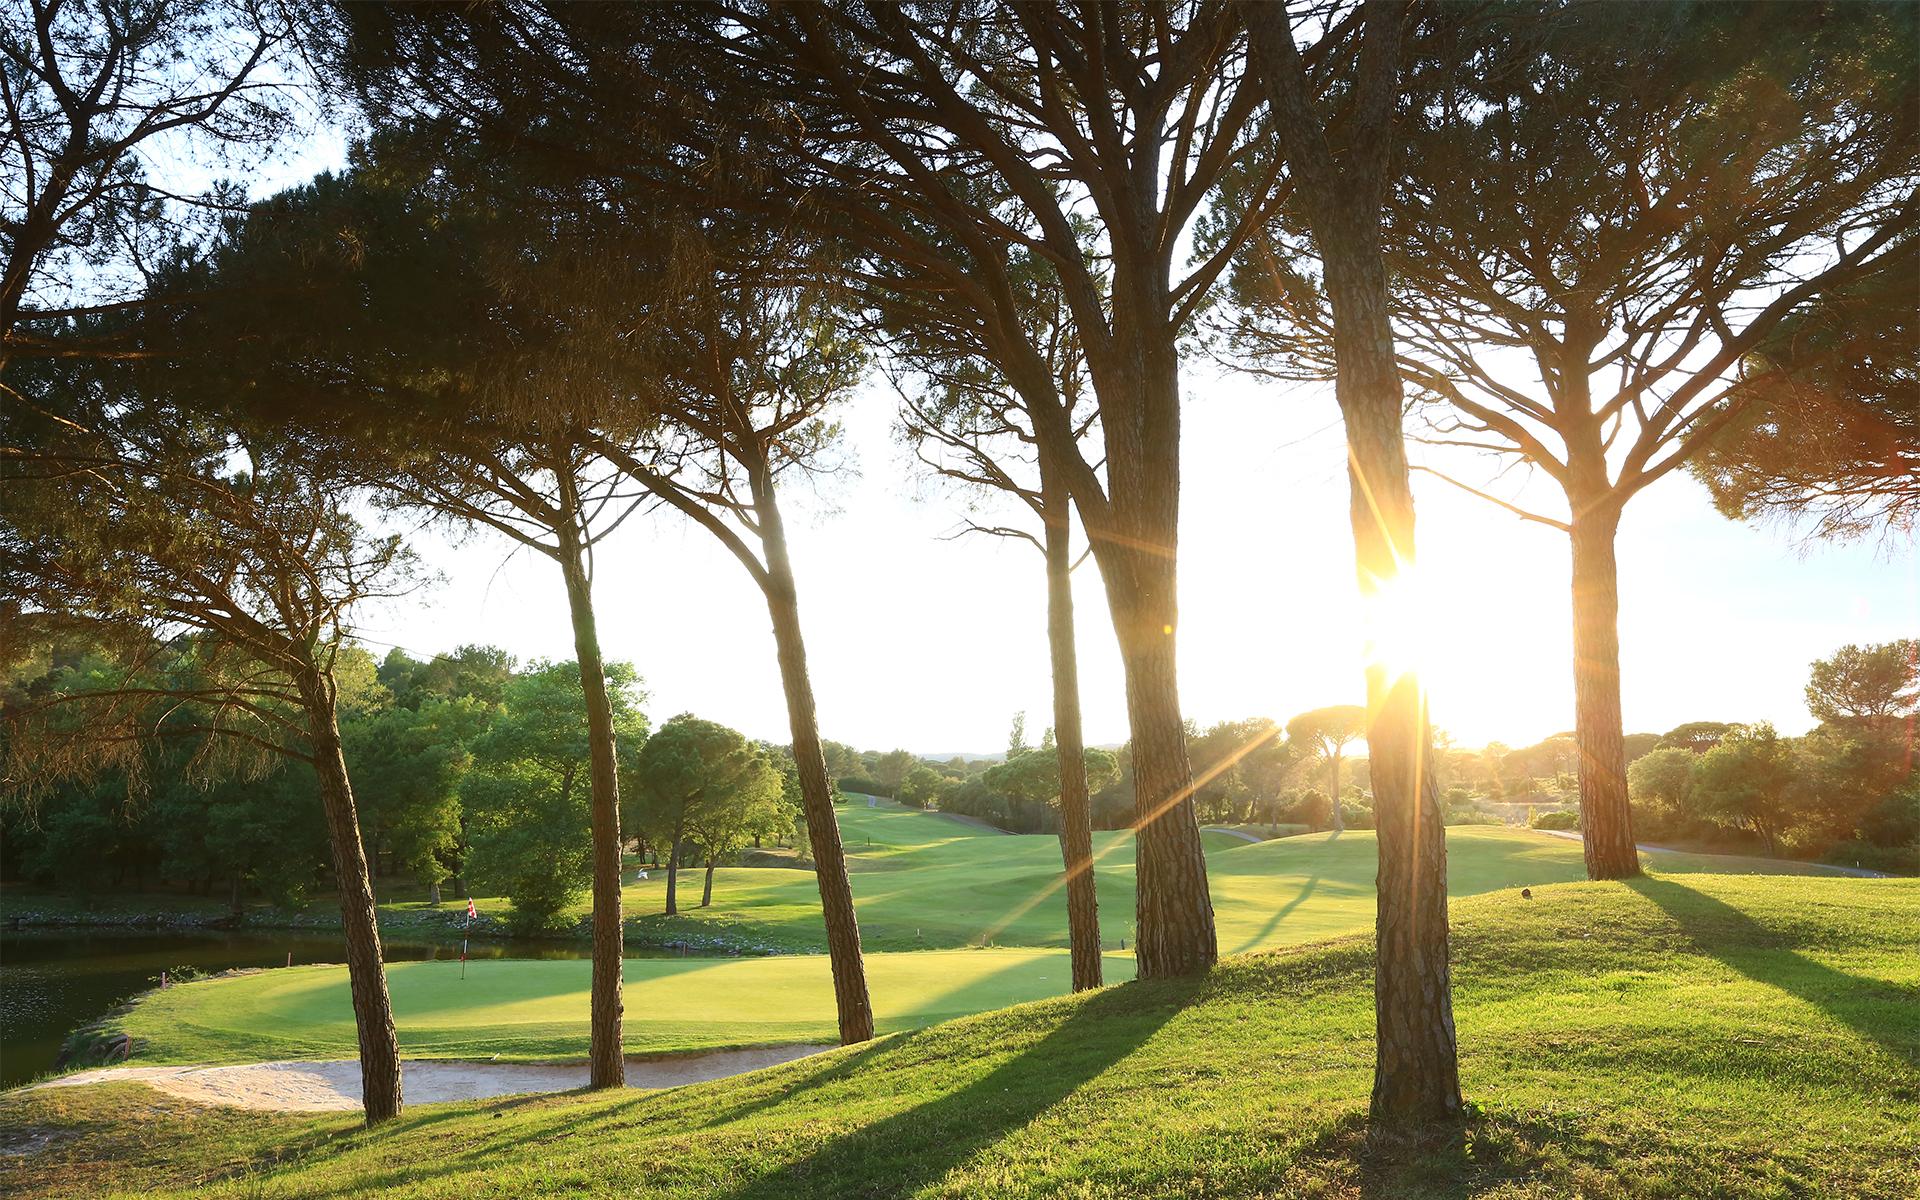 golf-expedition-golf-reizen-frankrijk-regio-cote-d'azur-Les-Domaines-de-Saint-Endréol-Golf-en-Spa-Resort-golfbaan